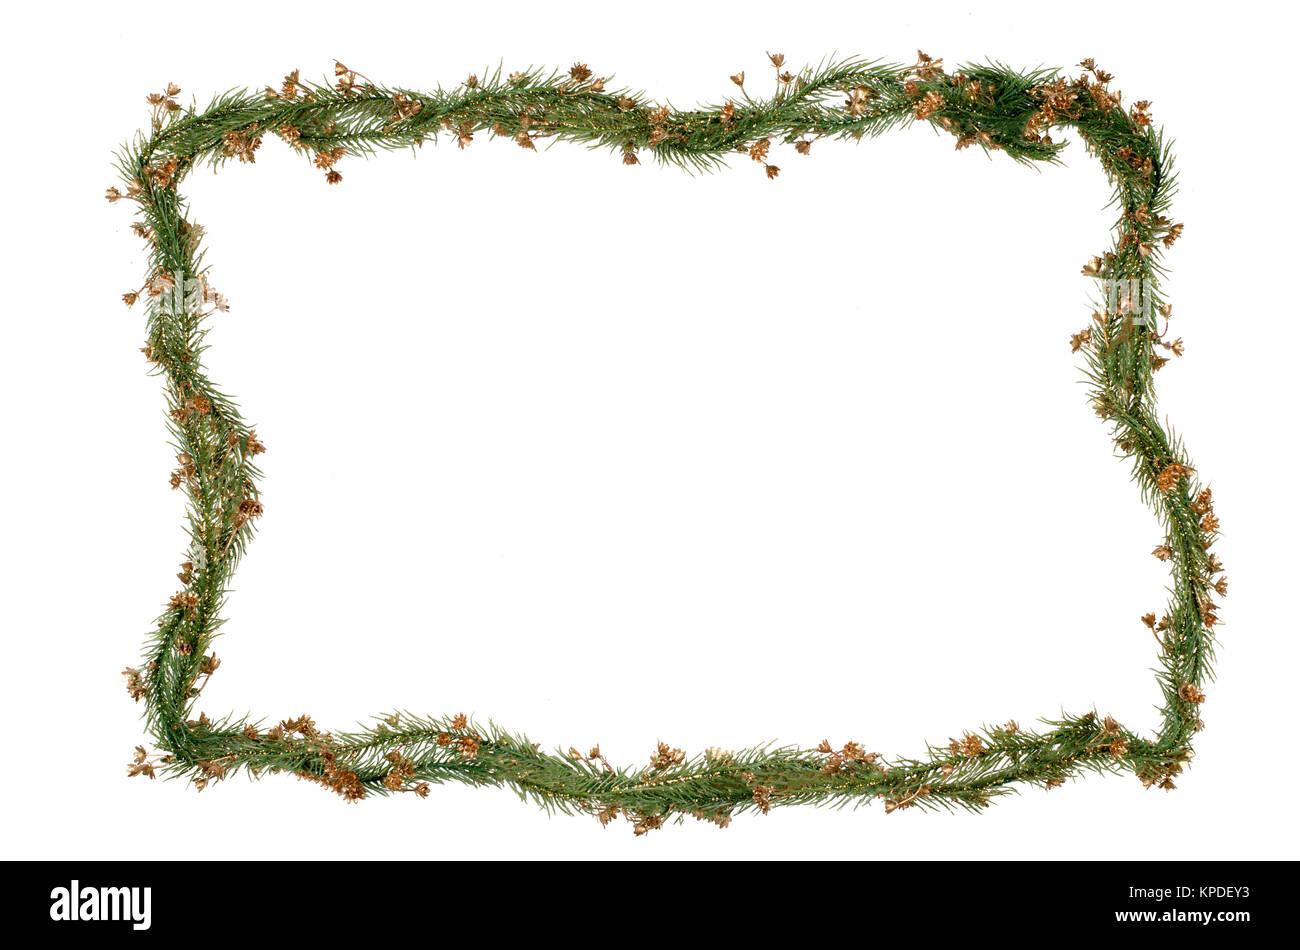 Christmas frame decoration - Stock Image